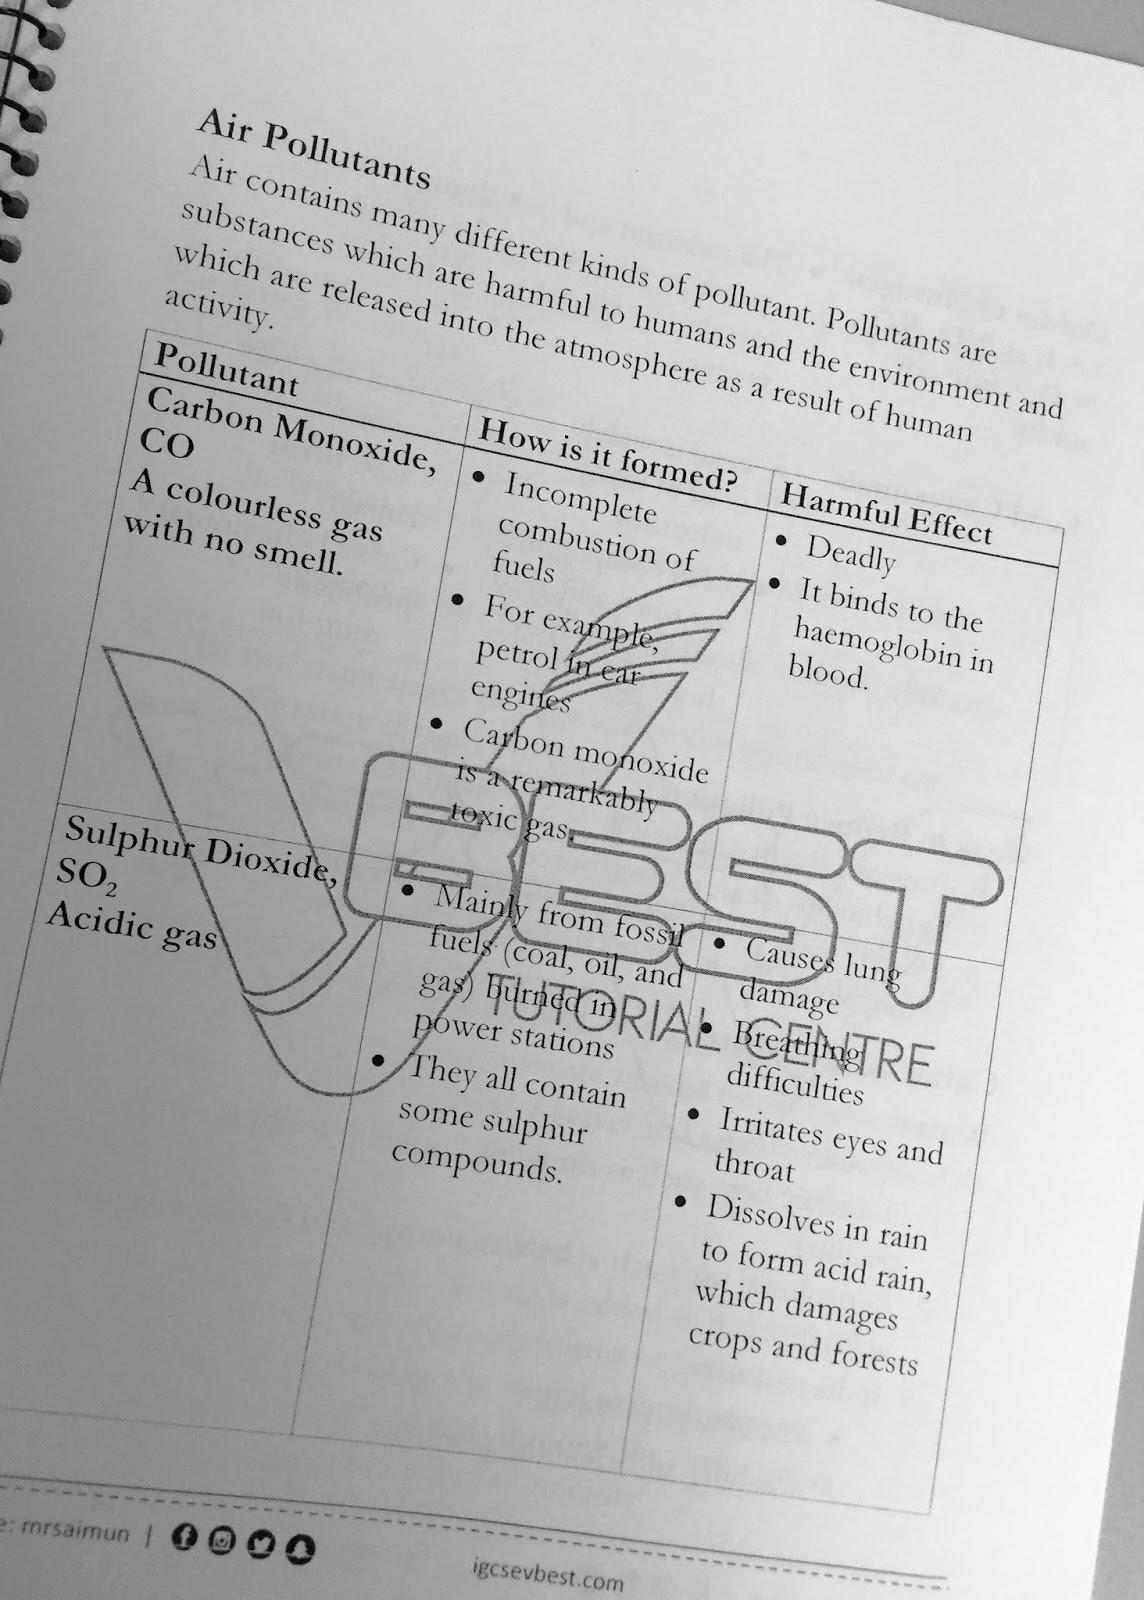 Analysis of Performance GCSE PE Coursework